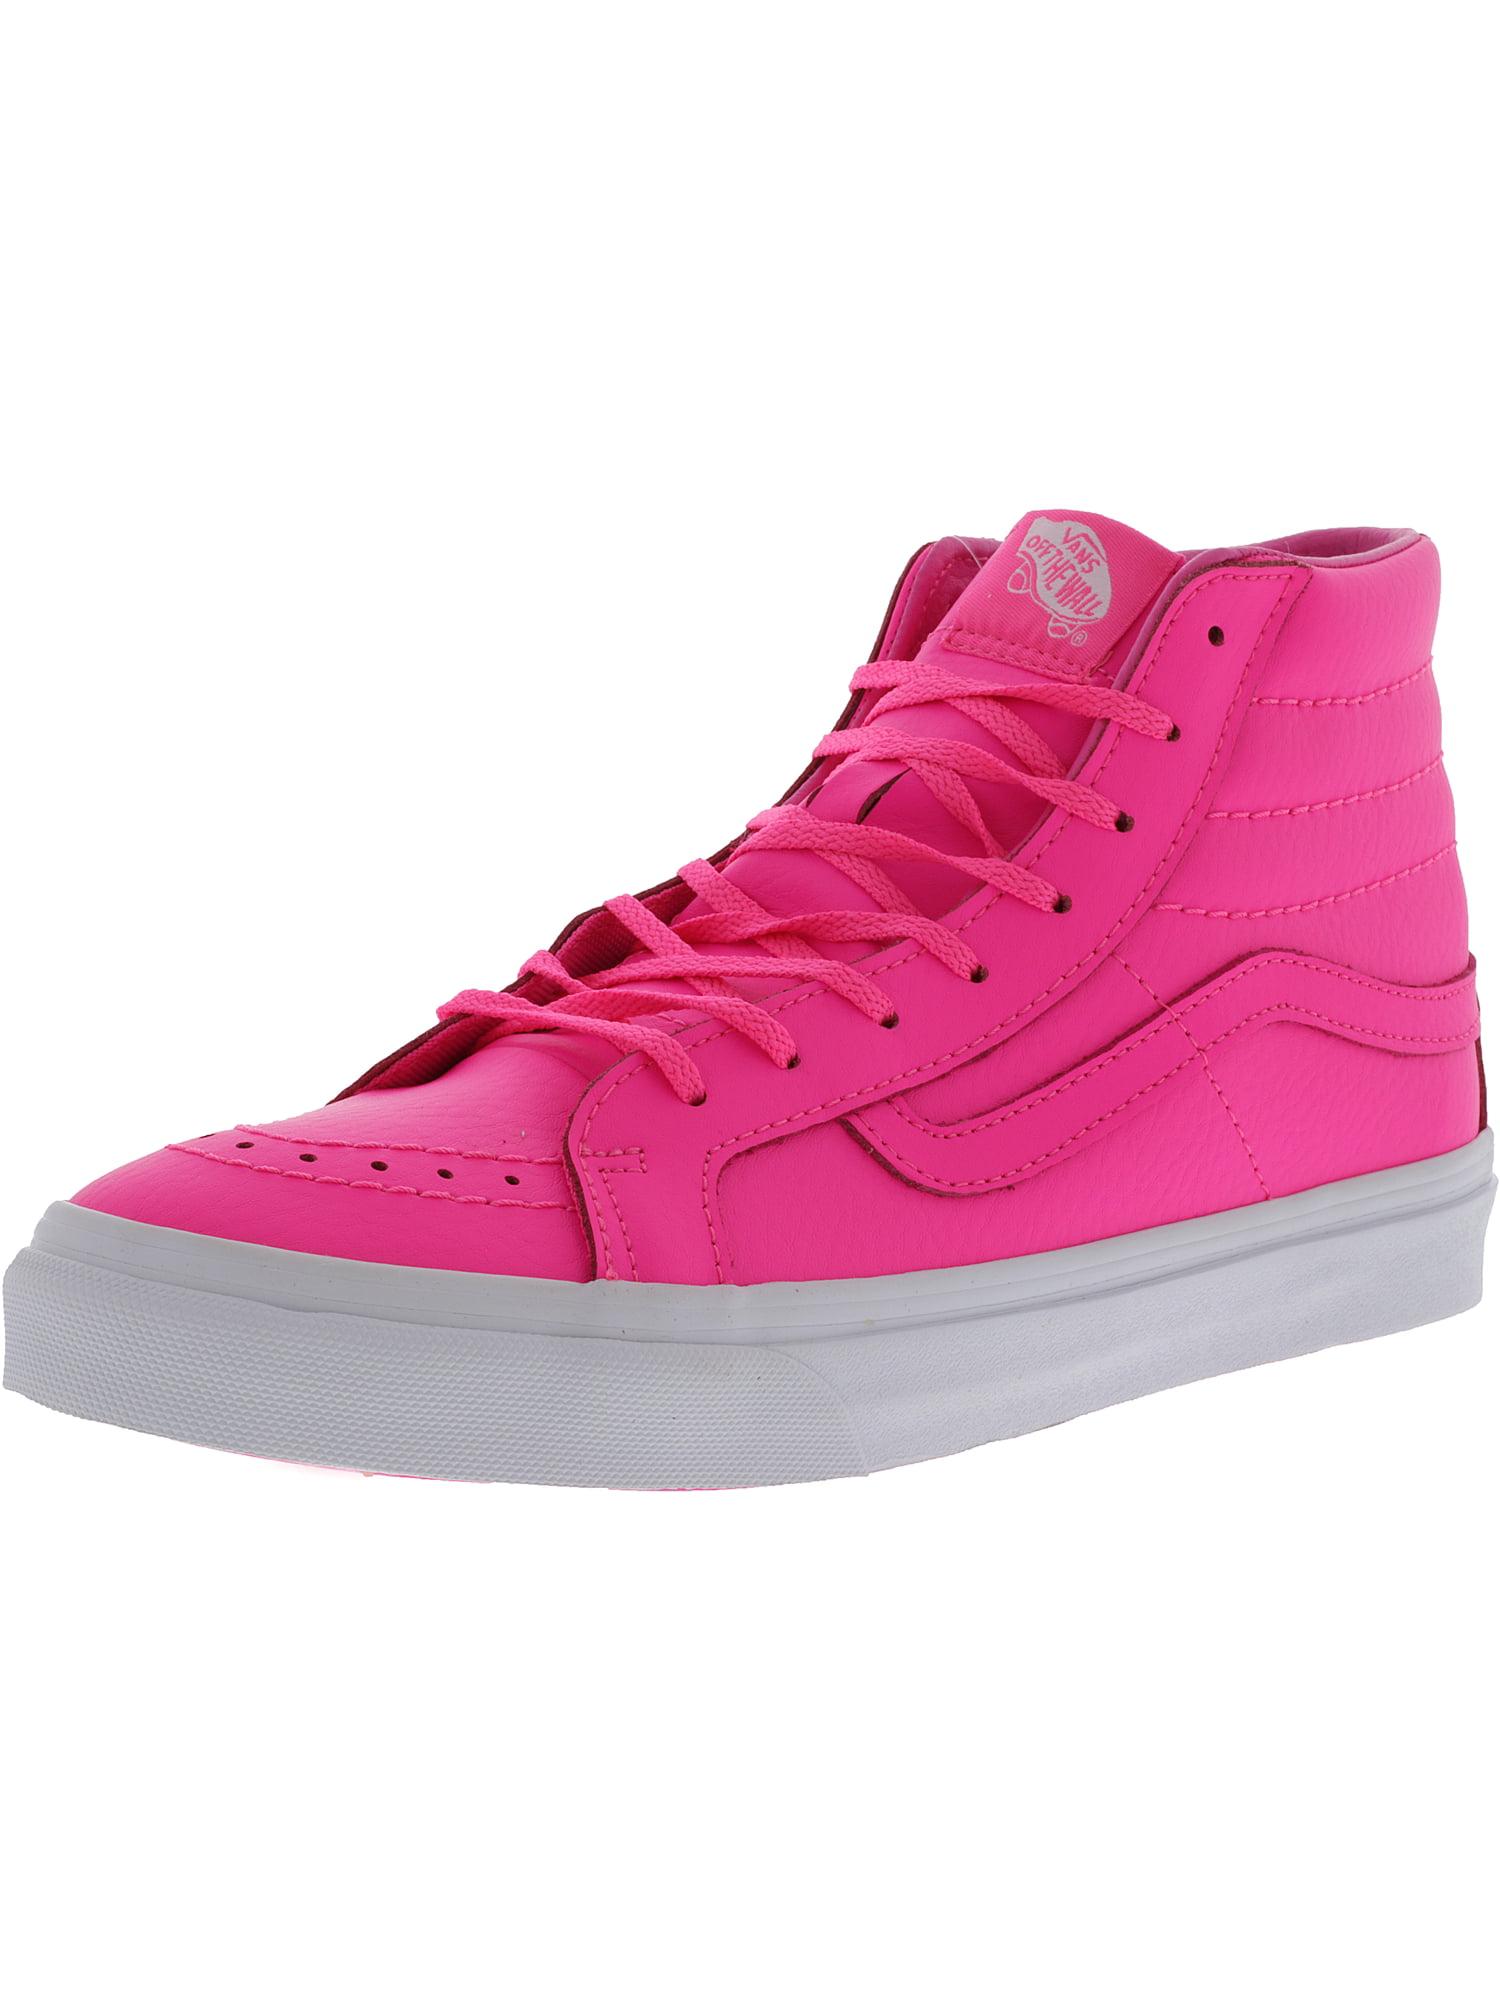 b0b35c1a801b29 Vans Sk8-Hi Slim Neon Leather Pink High-Top Skateboarding Shoe - 5.5M   4M